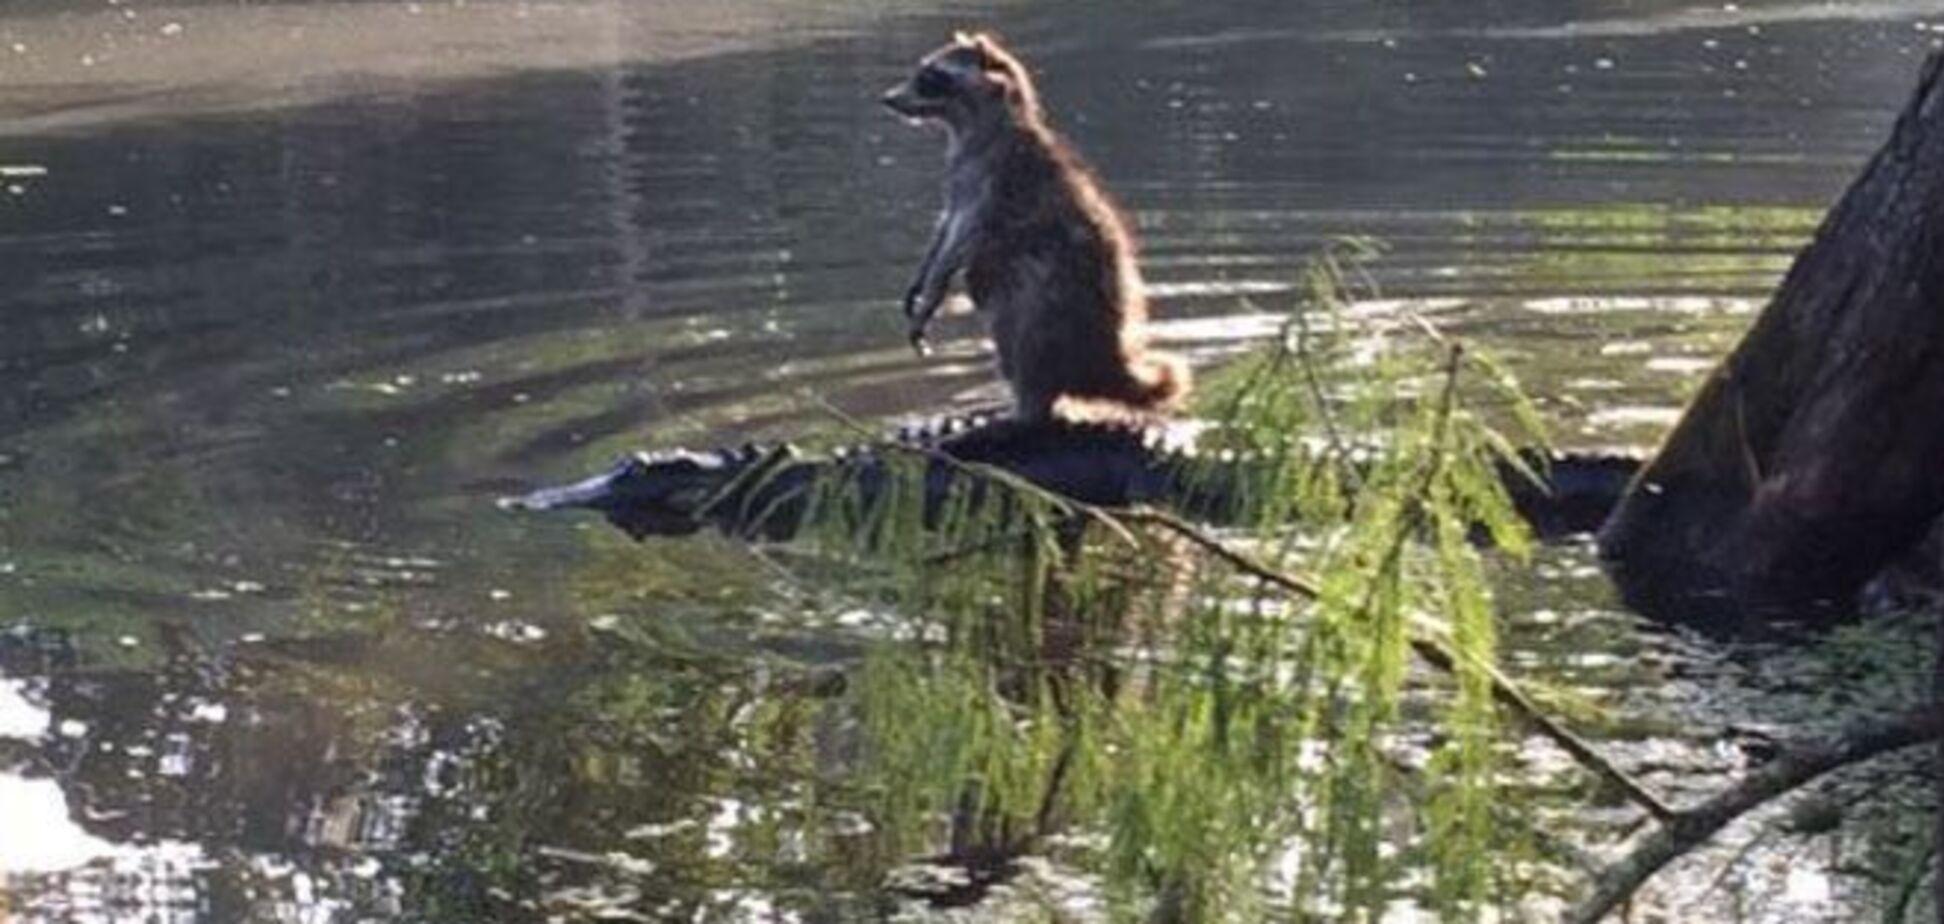 Енот, спасаясь бегством от ребенка, оседлал аллигатора: фотофакт